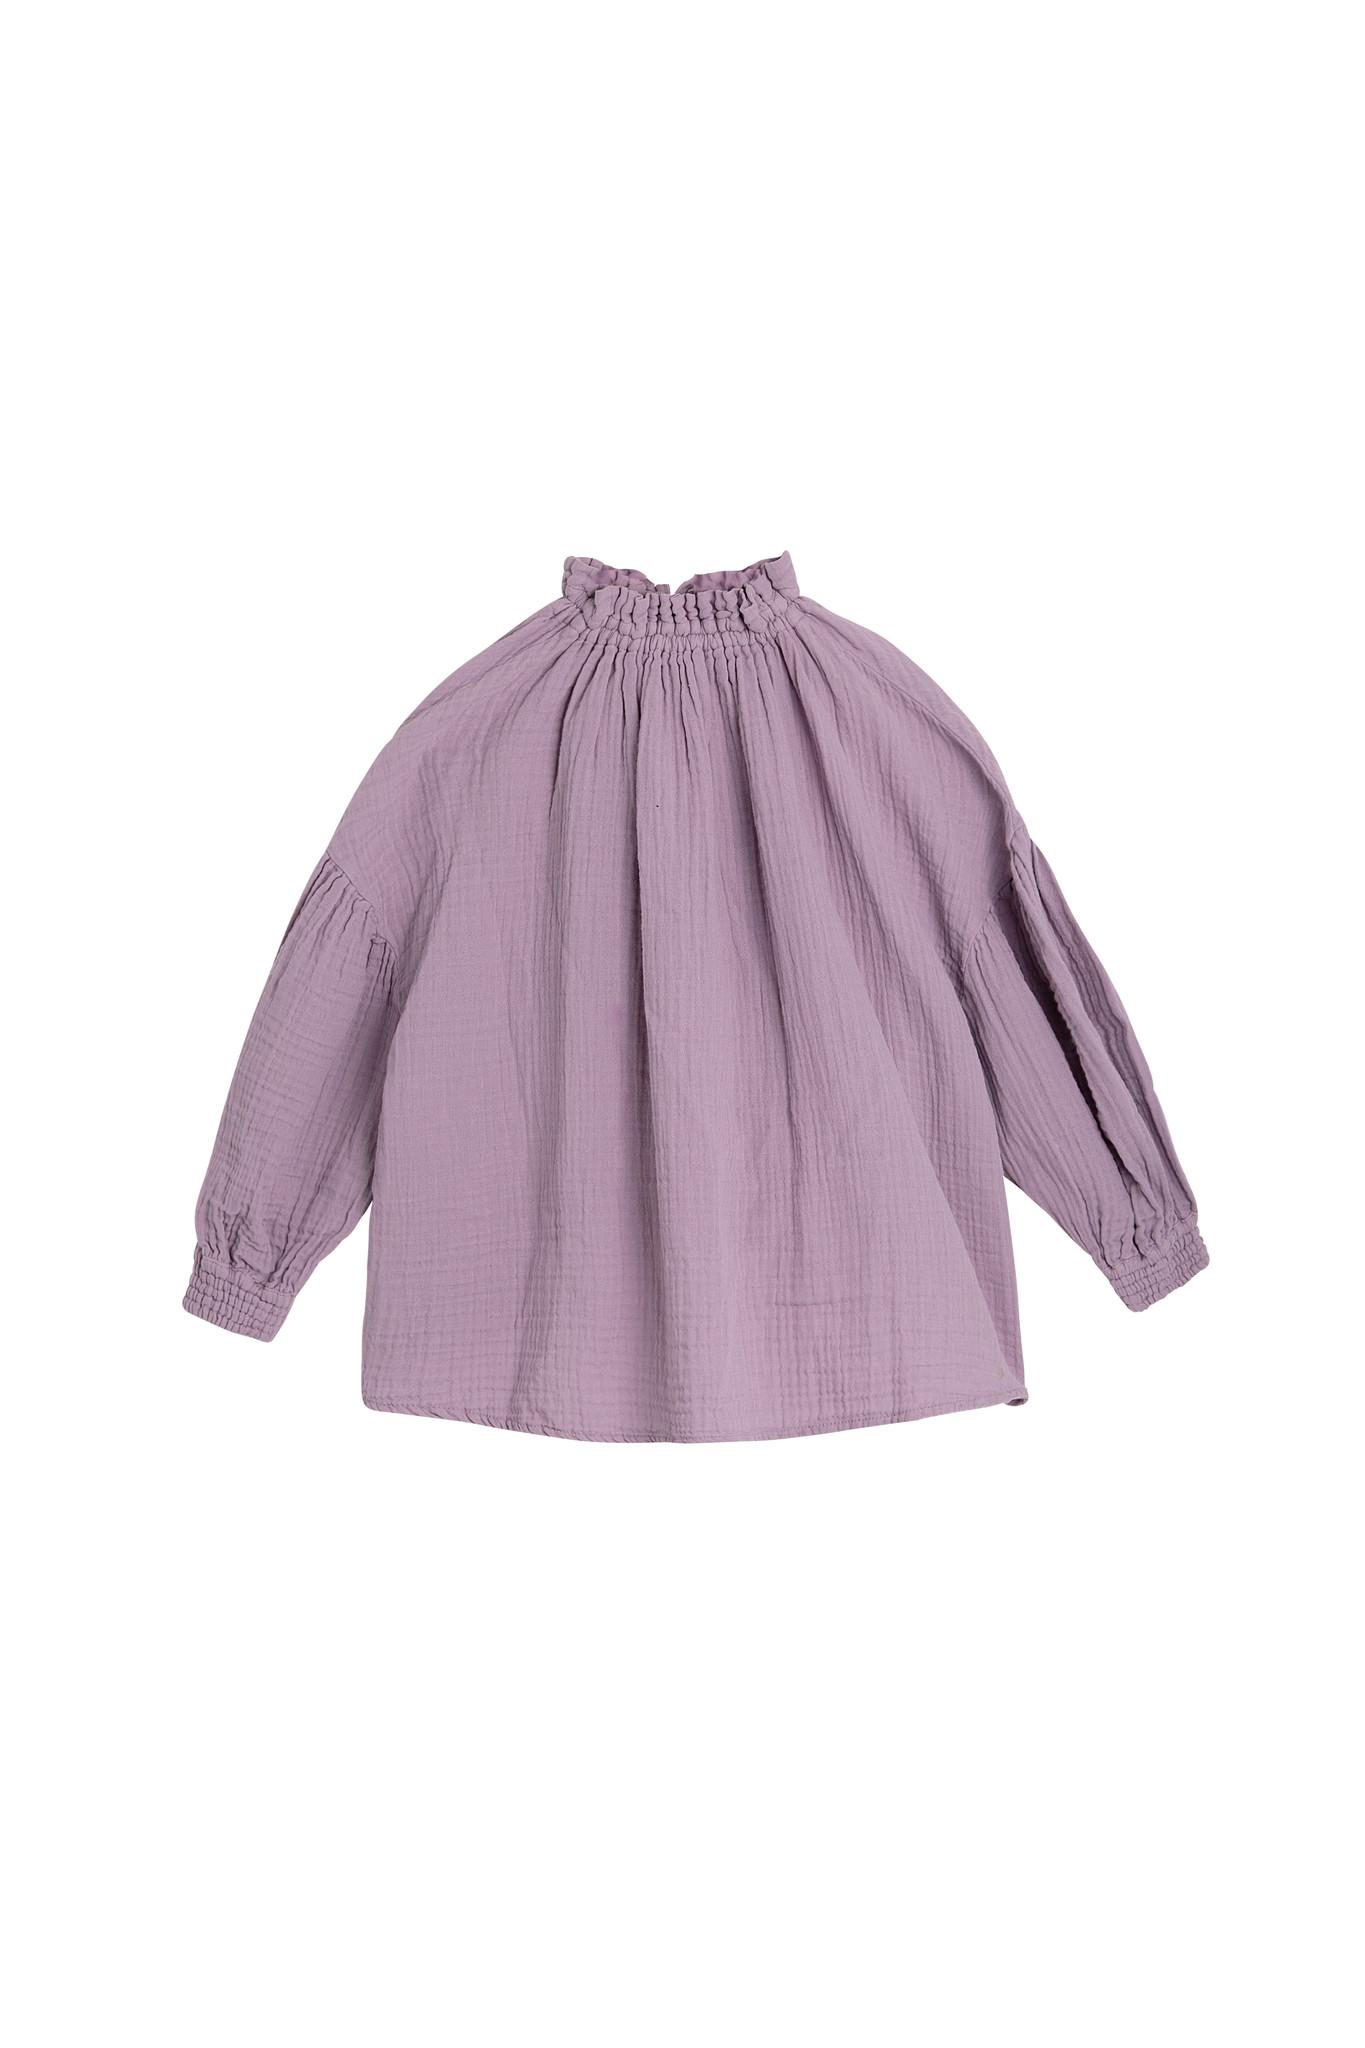 Olivia blouse - Lavanda-3